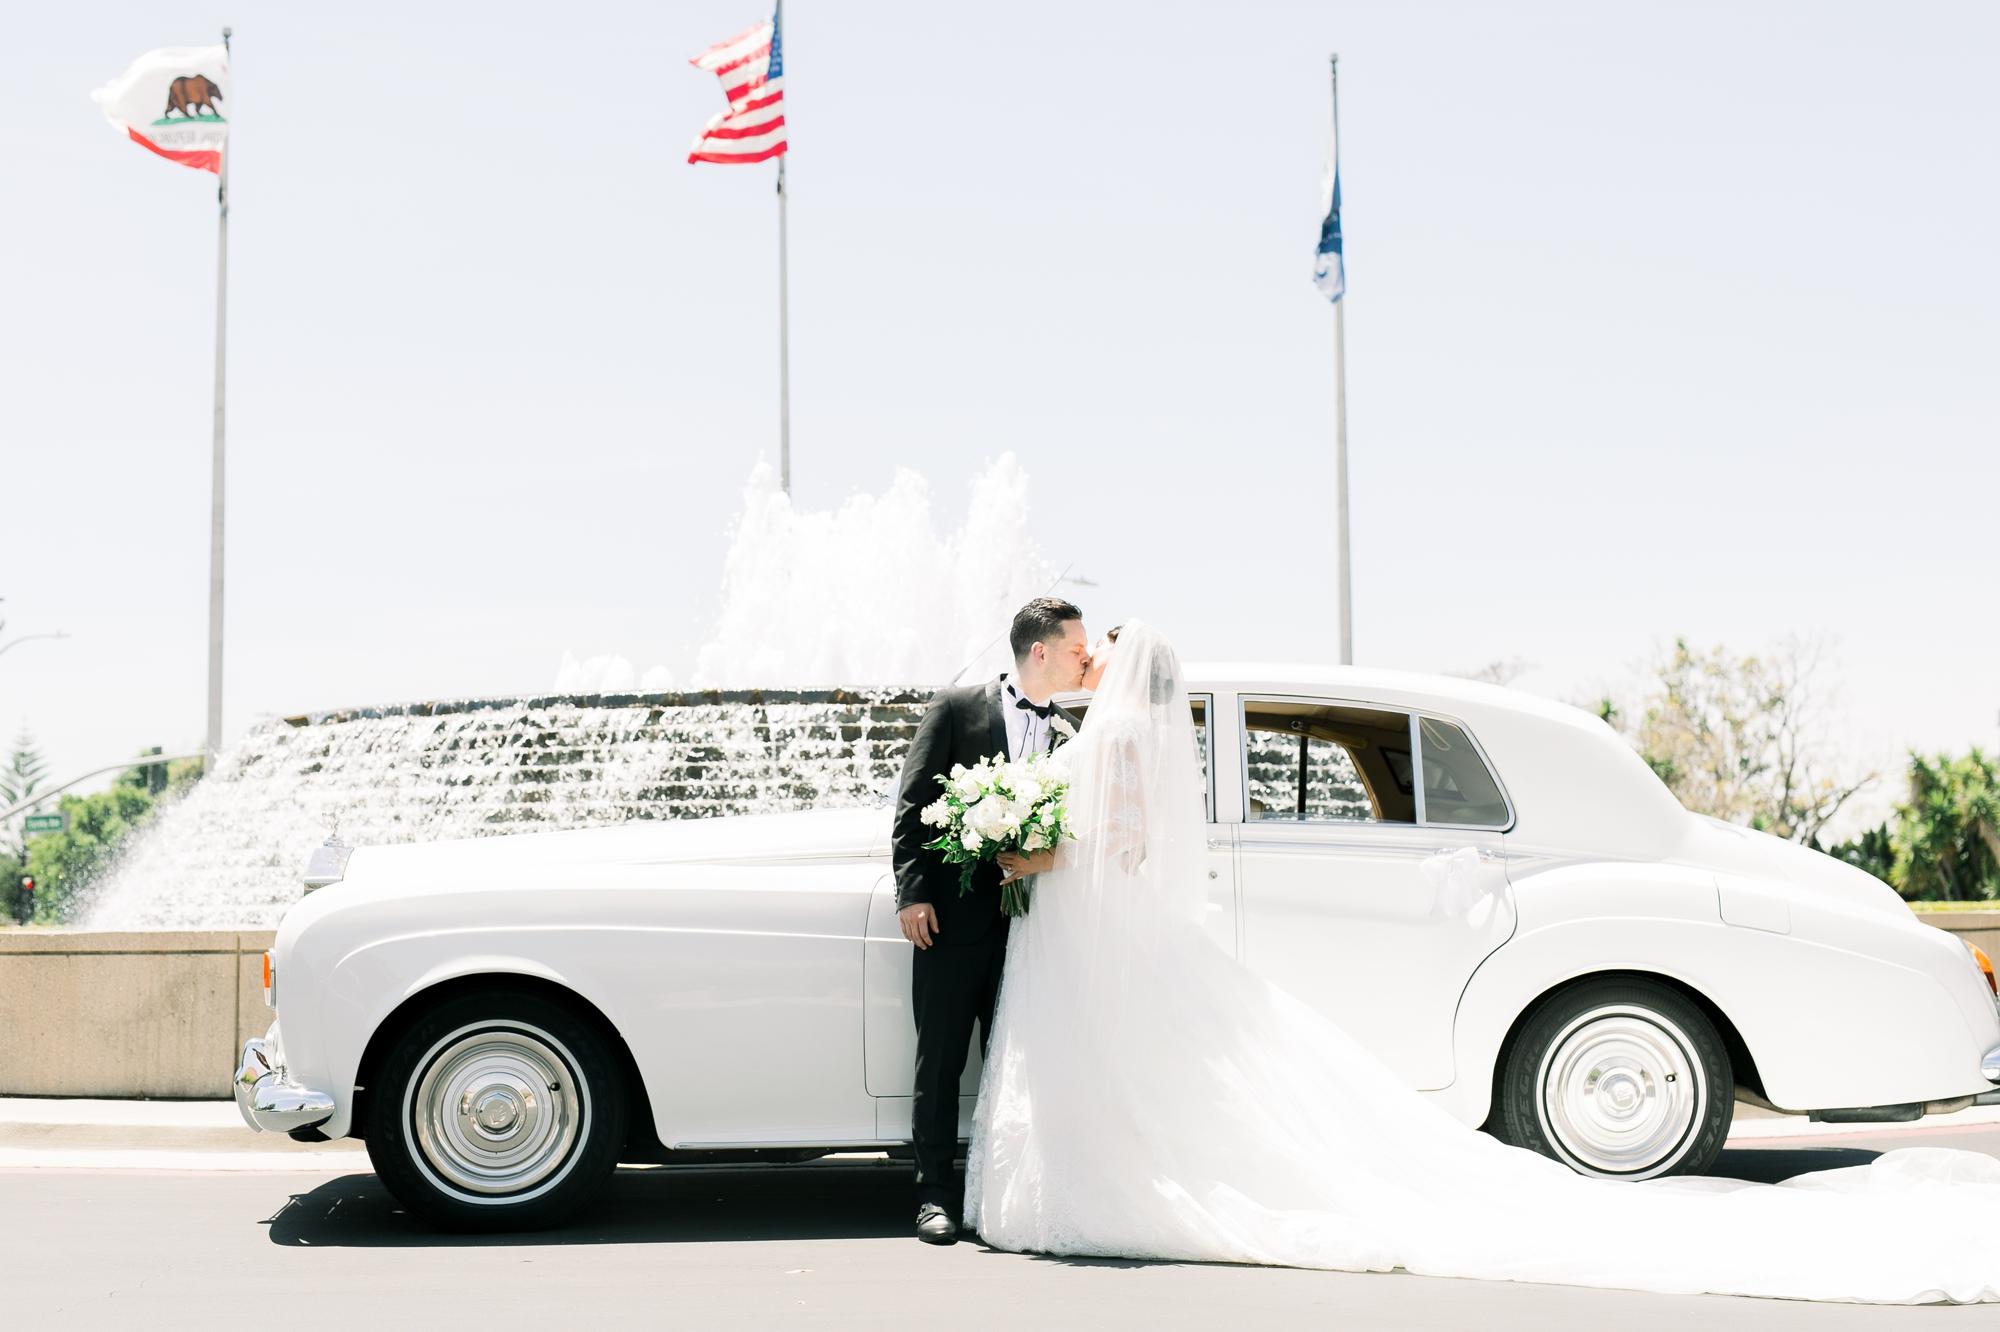 ROYAL-WEDDING-RICHARD-NIXON-LIBRARY 6.jpg